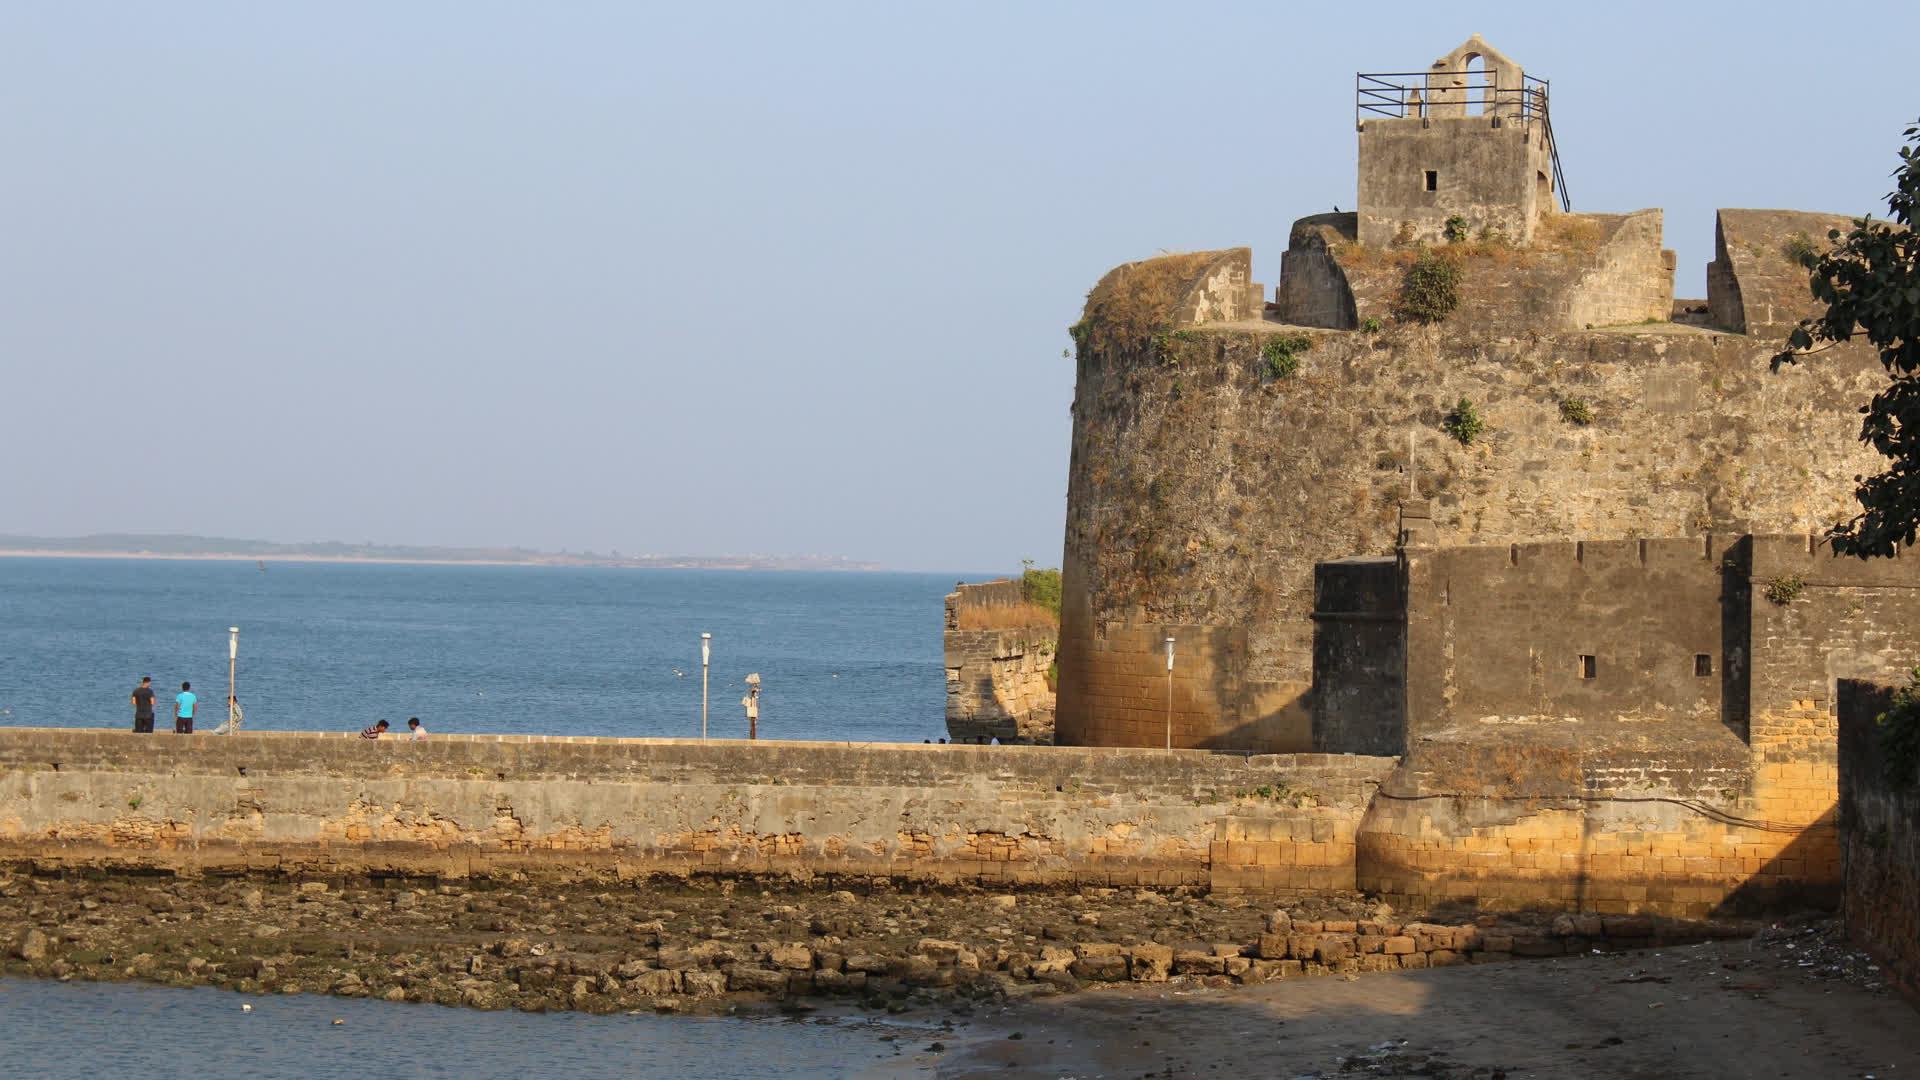 Diu: A Historic Island Outpost